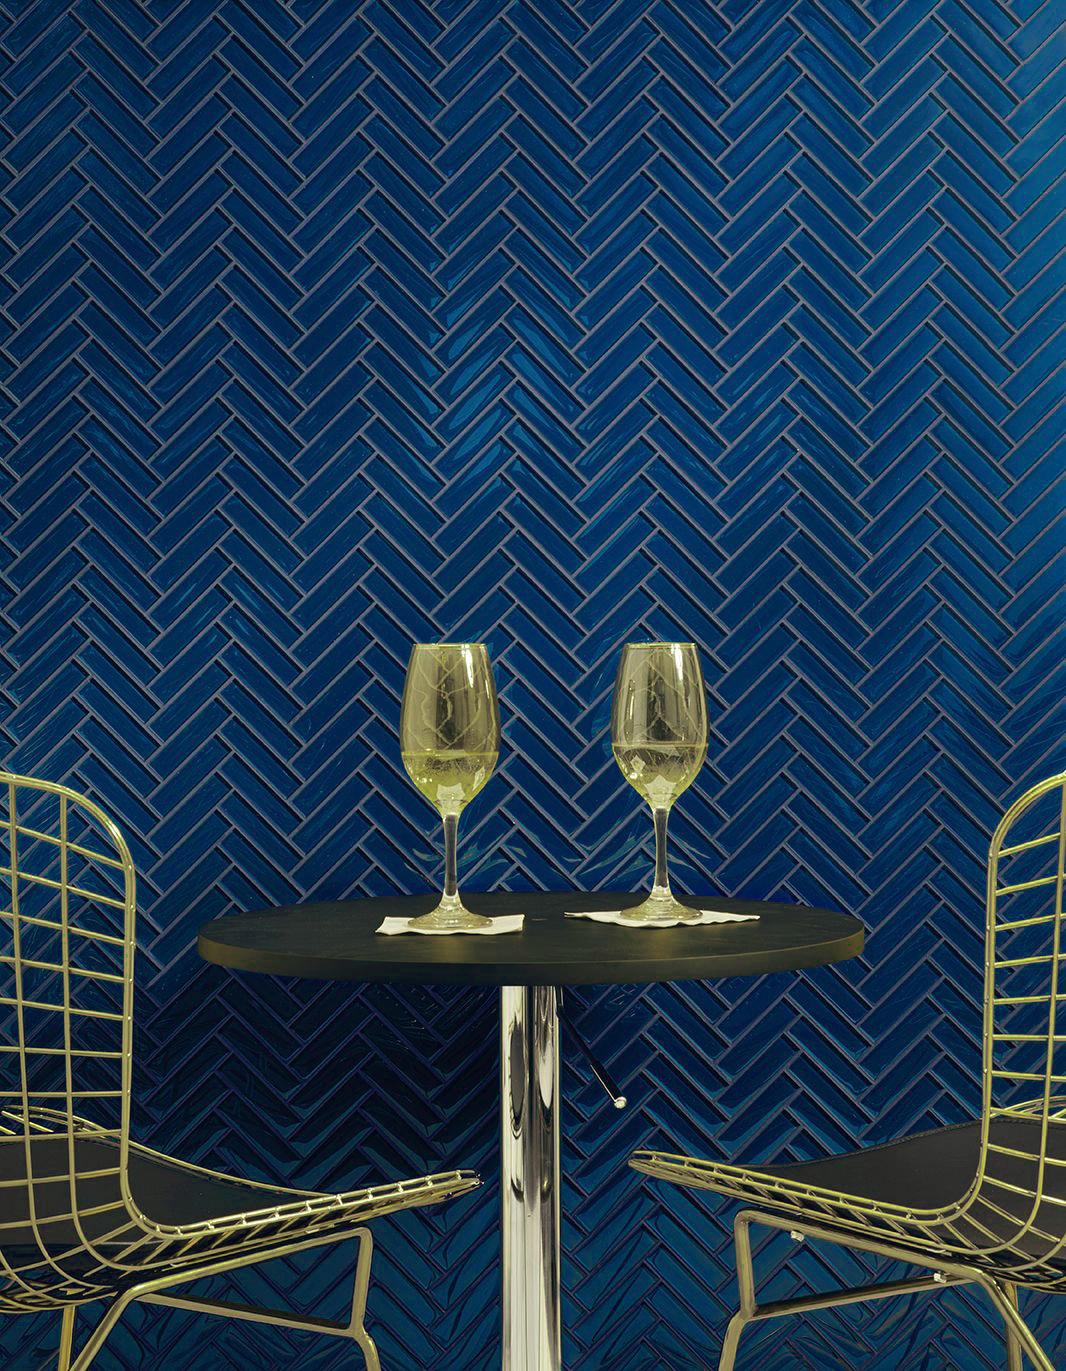 malla-chewron-blue-mozaika-obdelnik-rybi-kost-modra-04